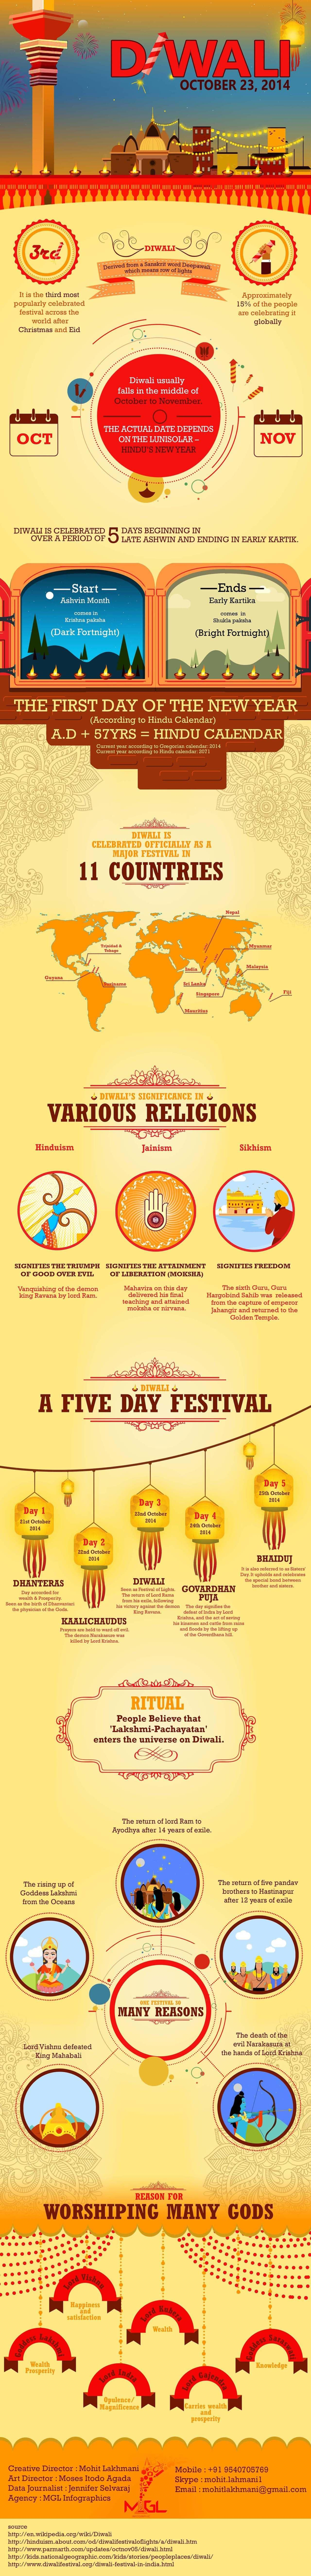 Diwali Infographic